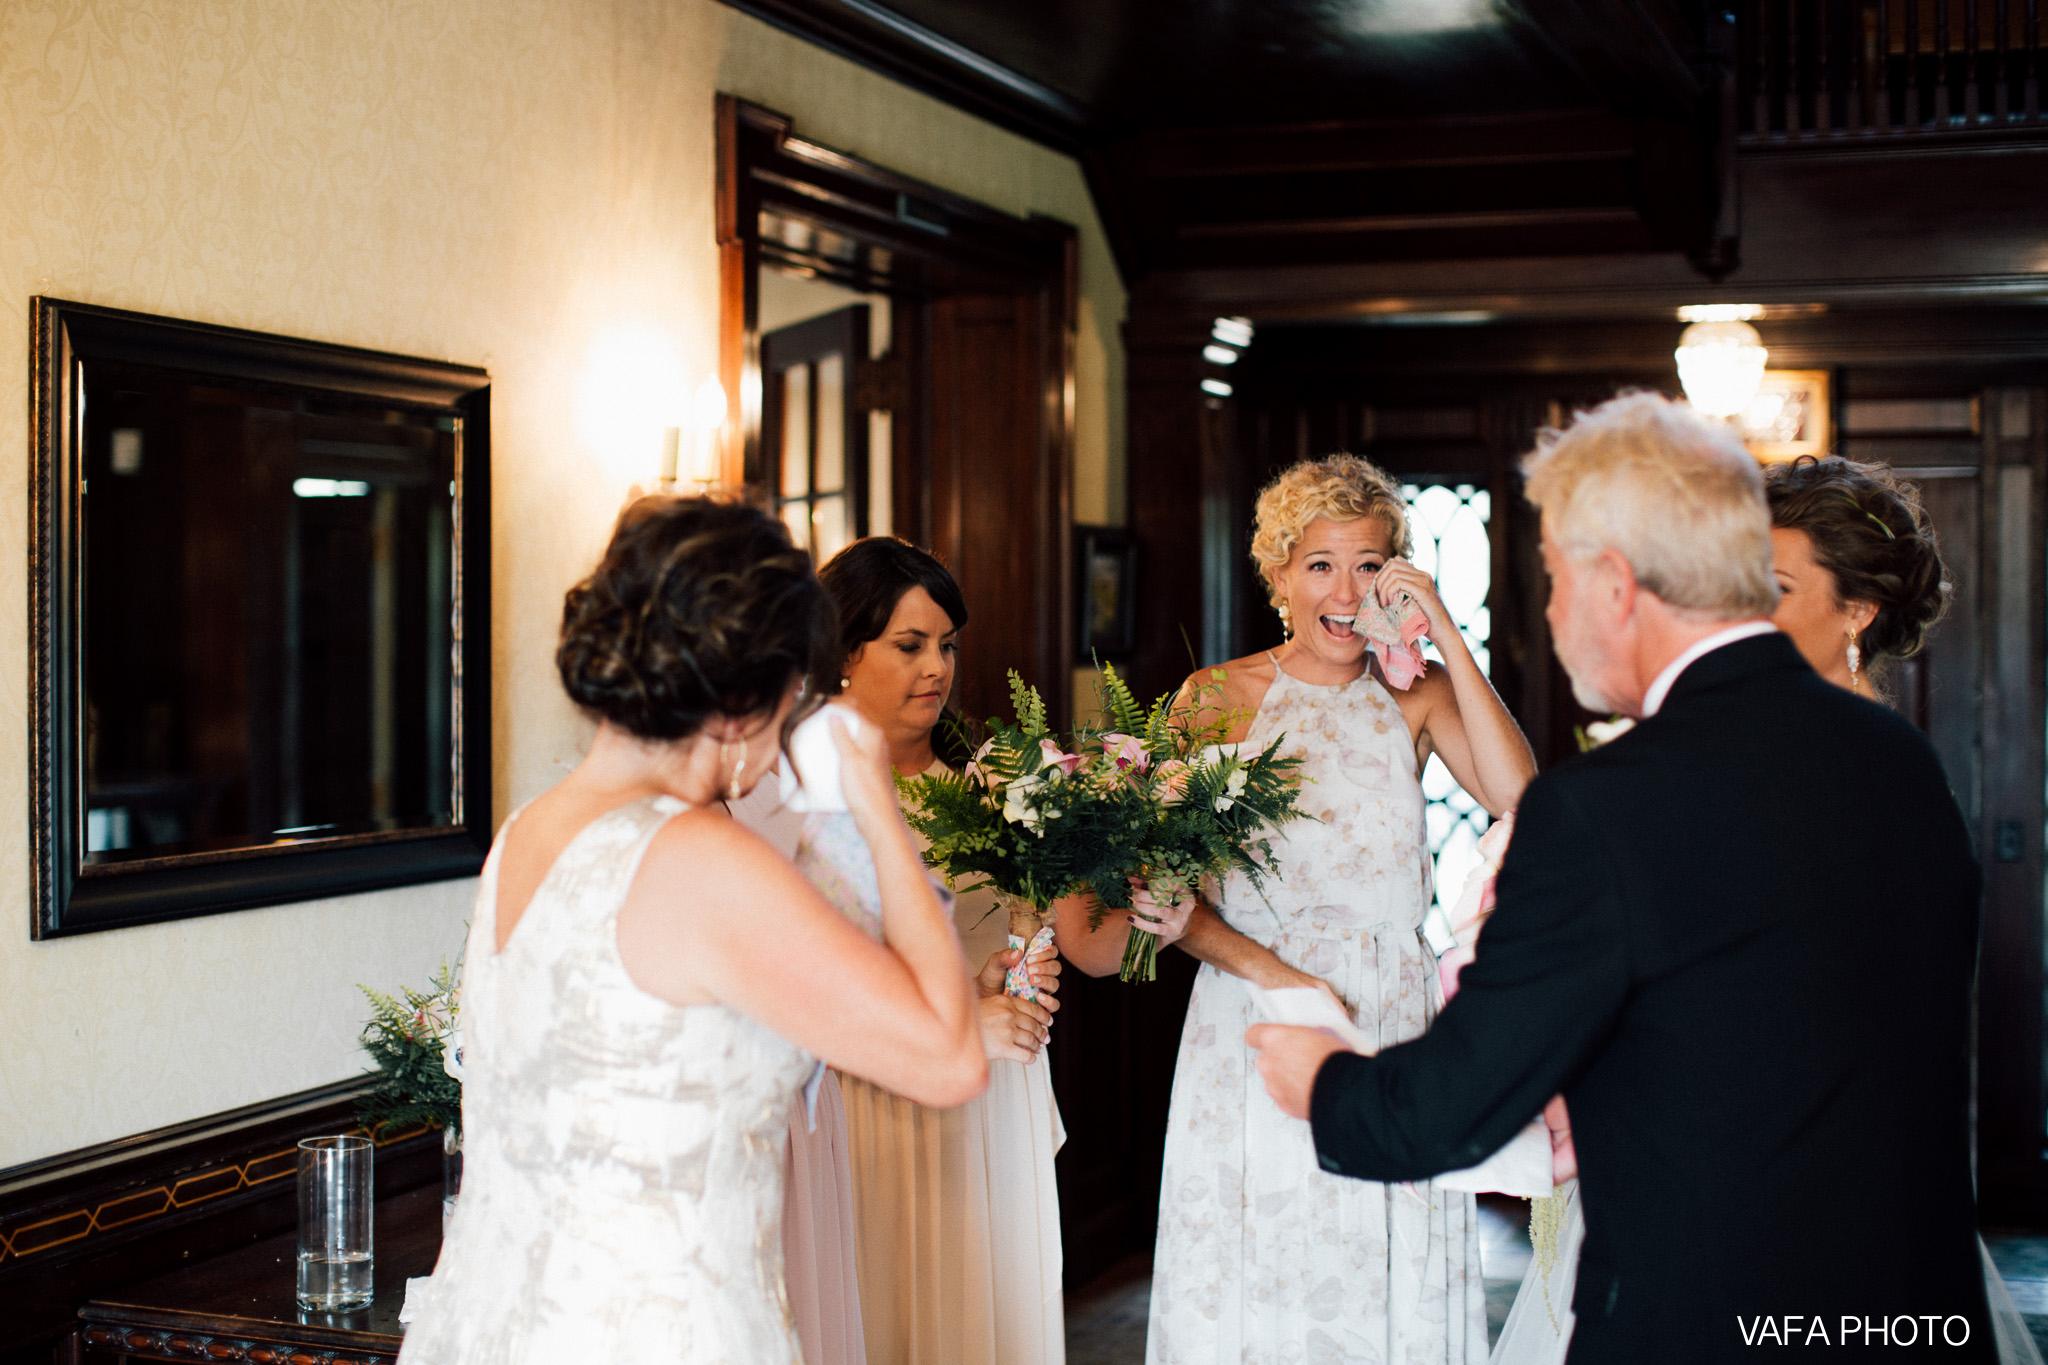 The-Felt-Estate-Wedding-Kailie-David-Vafa-Photo-194.jpg